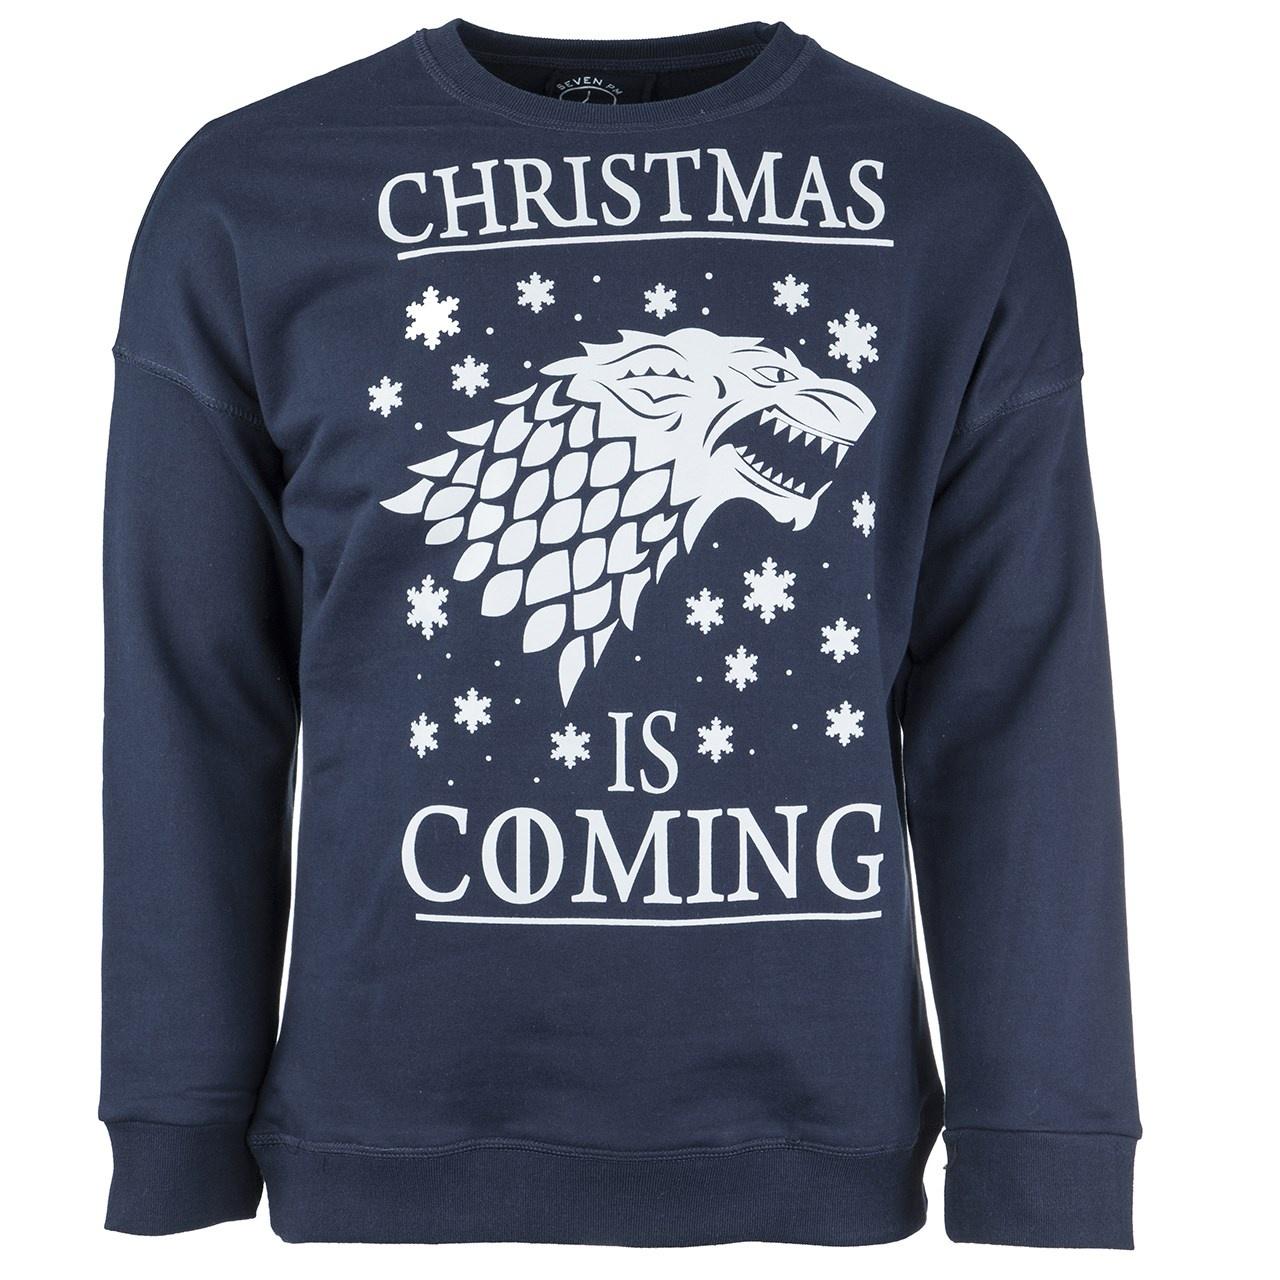 پولیور سرمه ای مردانه سون پی ام مدل Christmas Is Coming